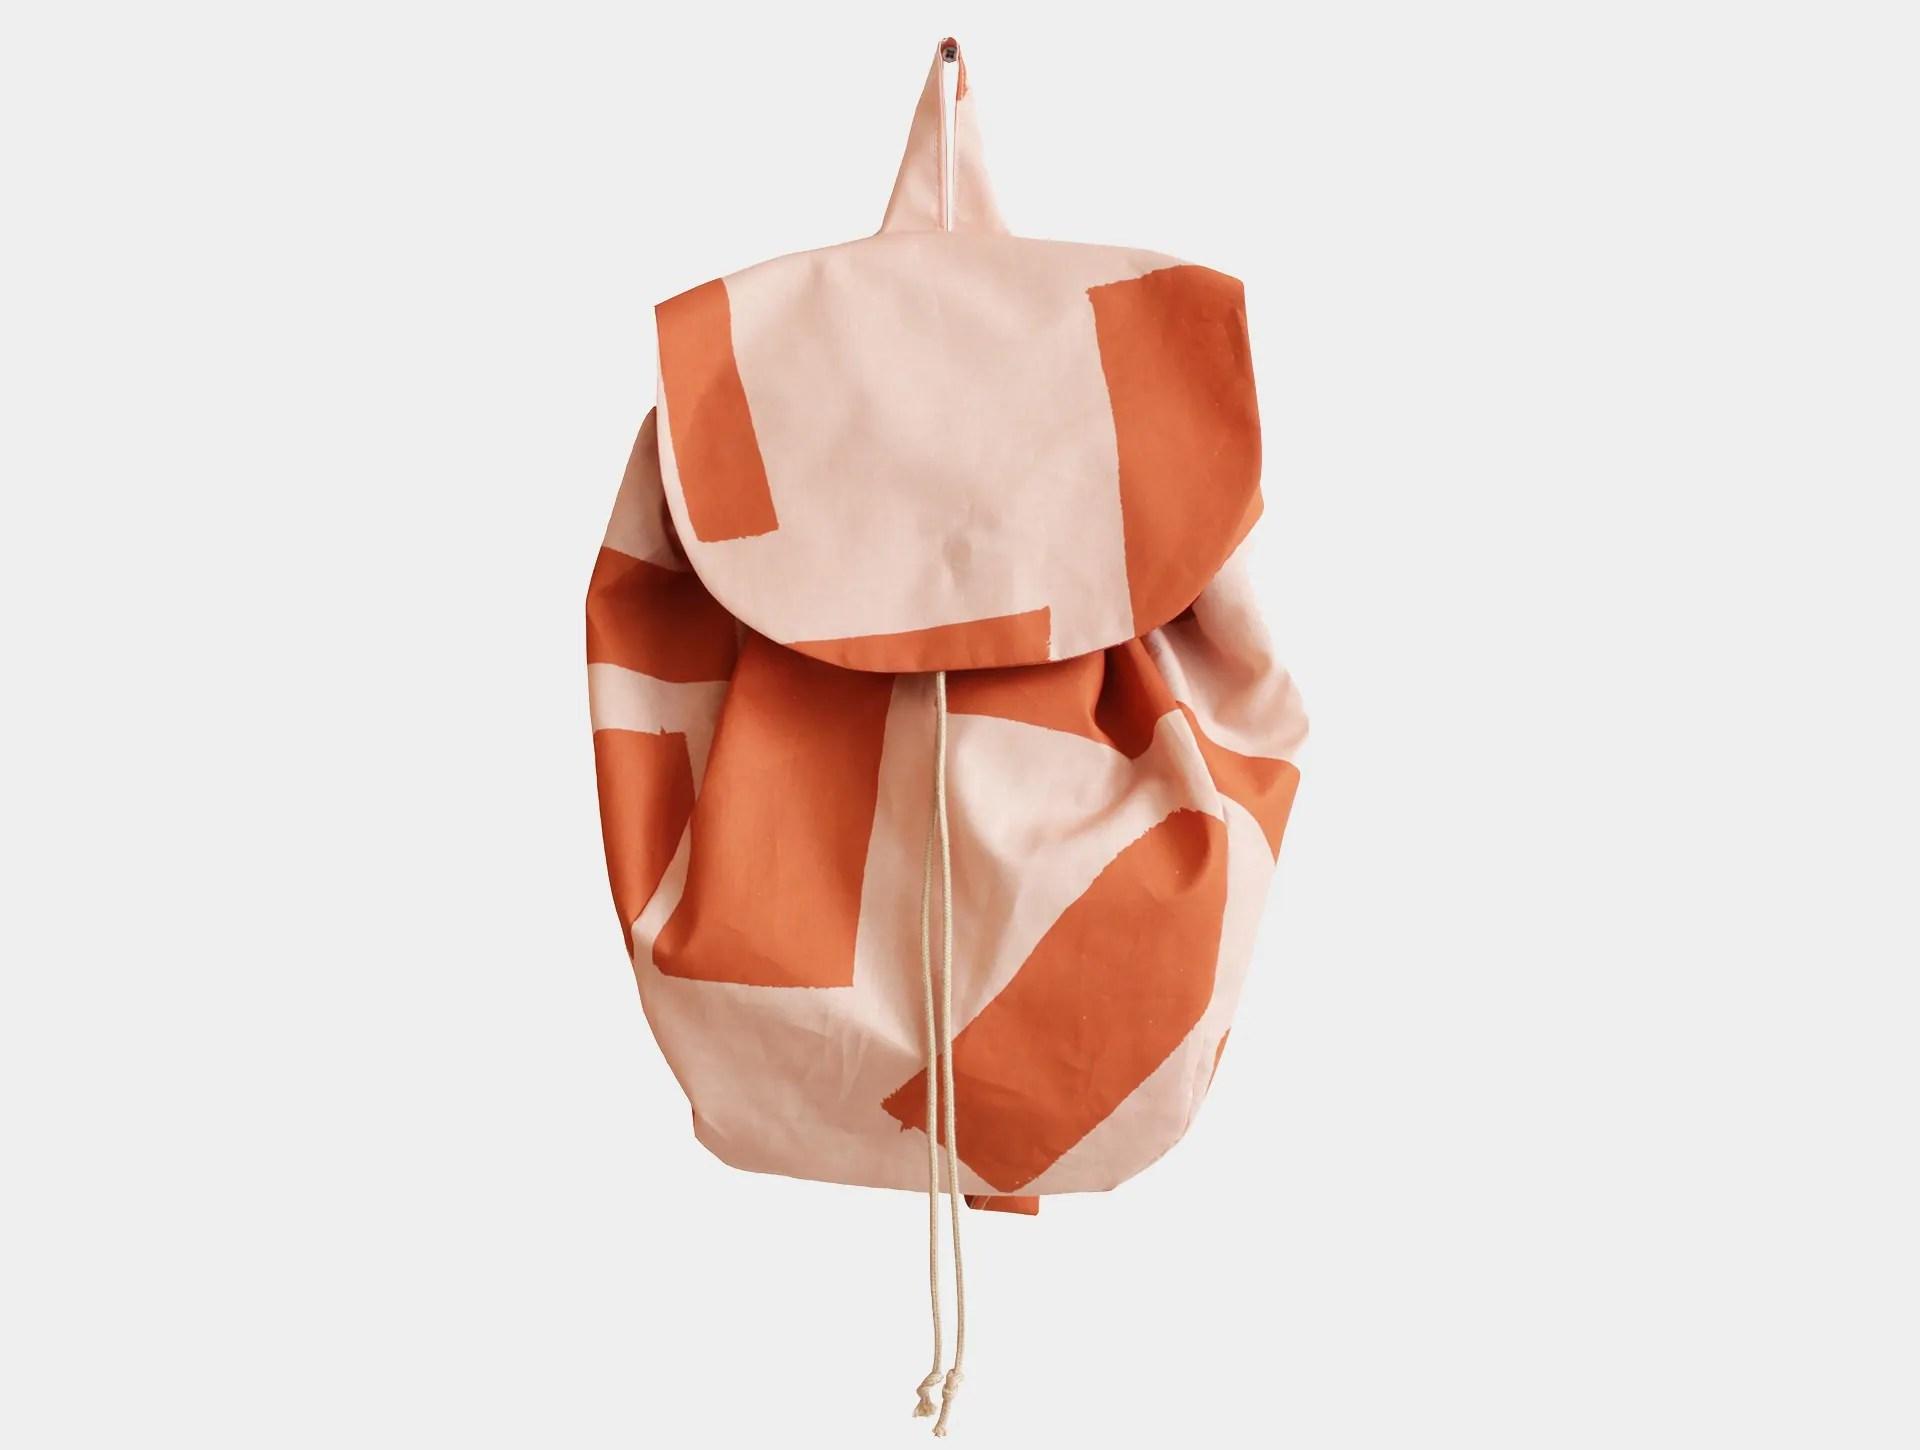 Rugzakje roze  roest  Jantien Baas  Textile Designer